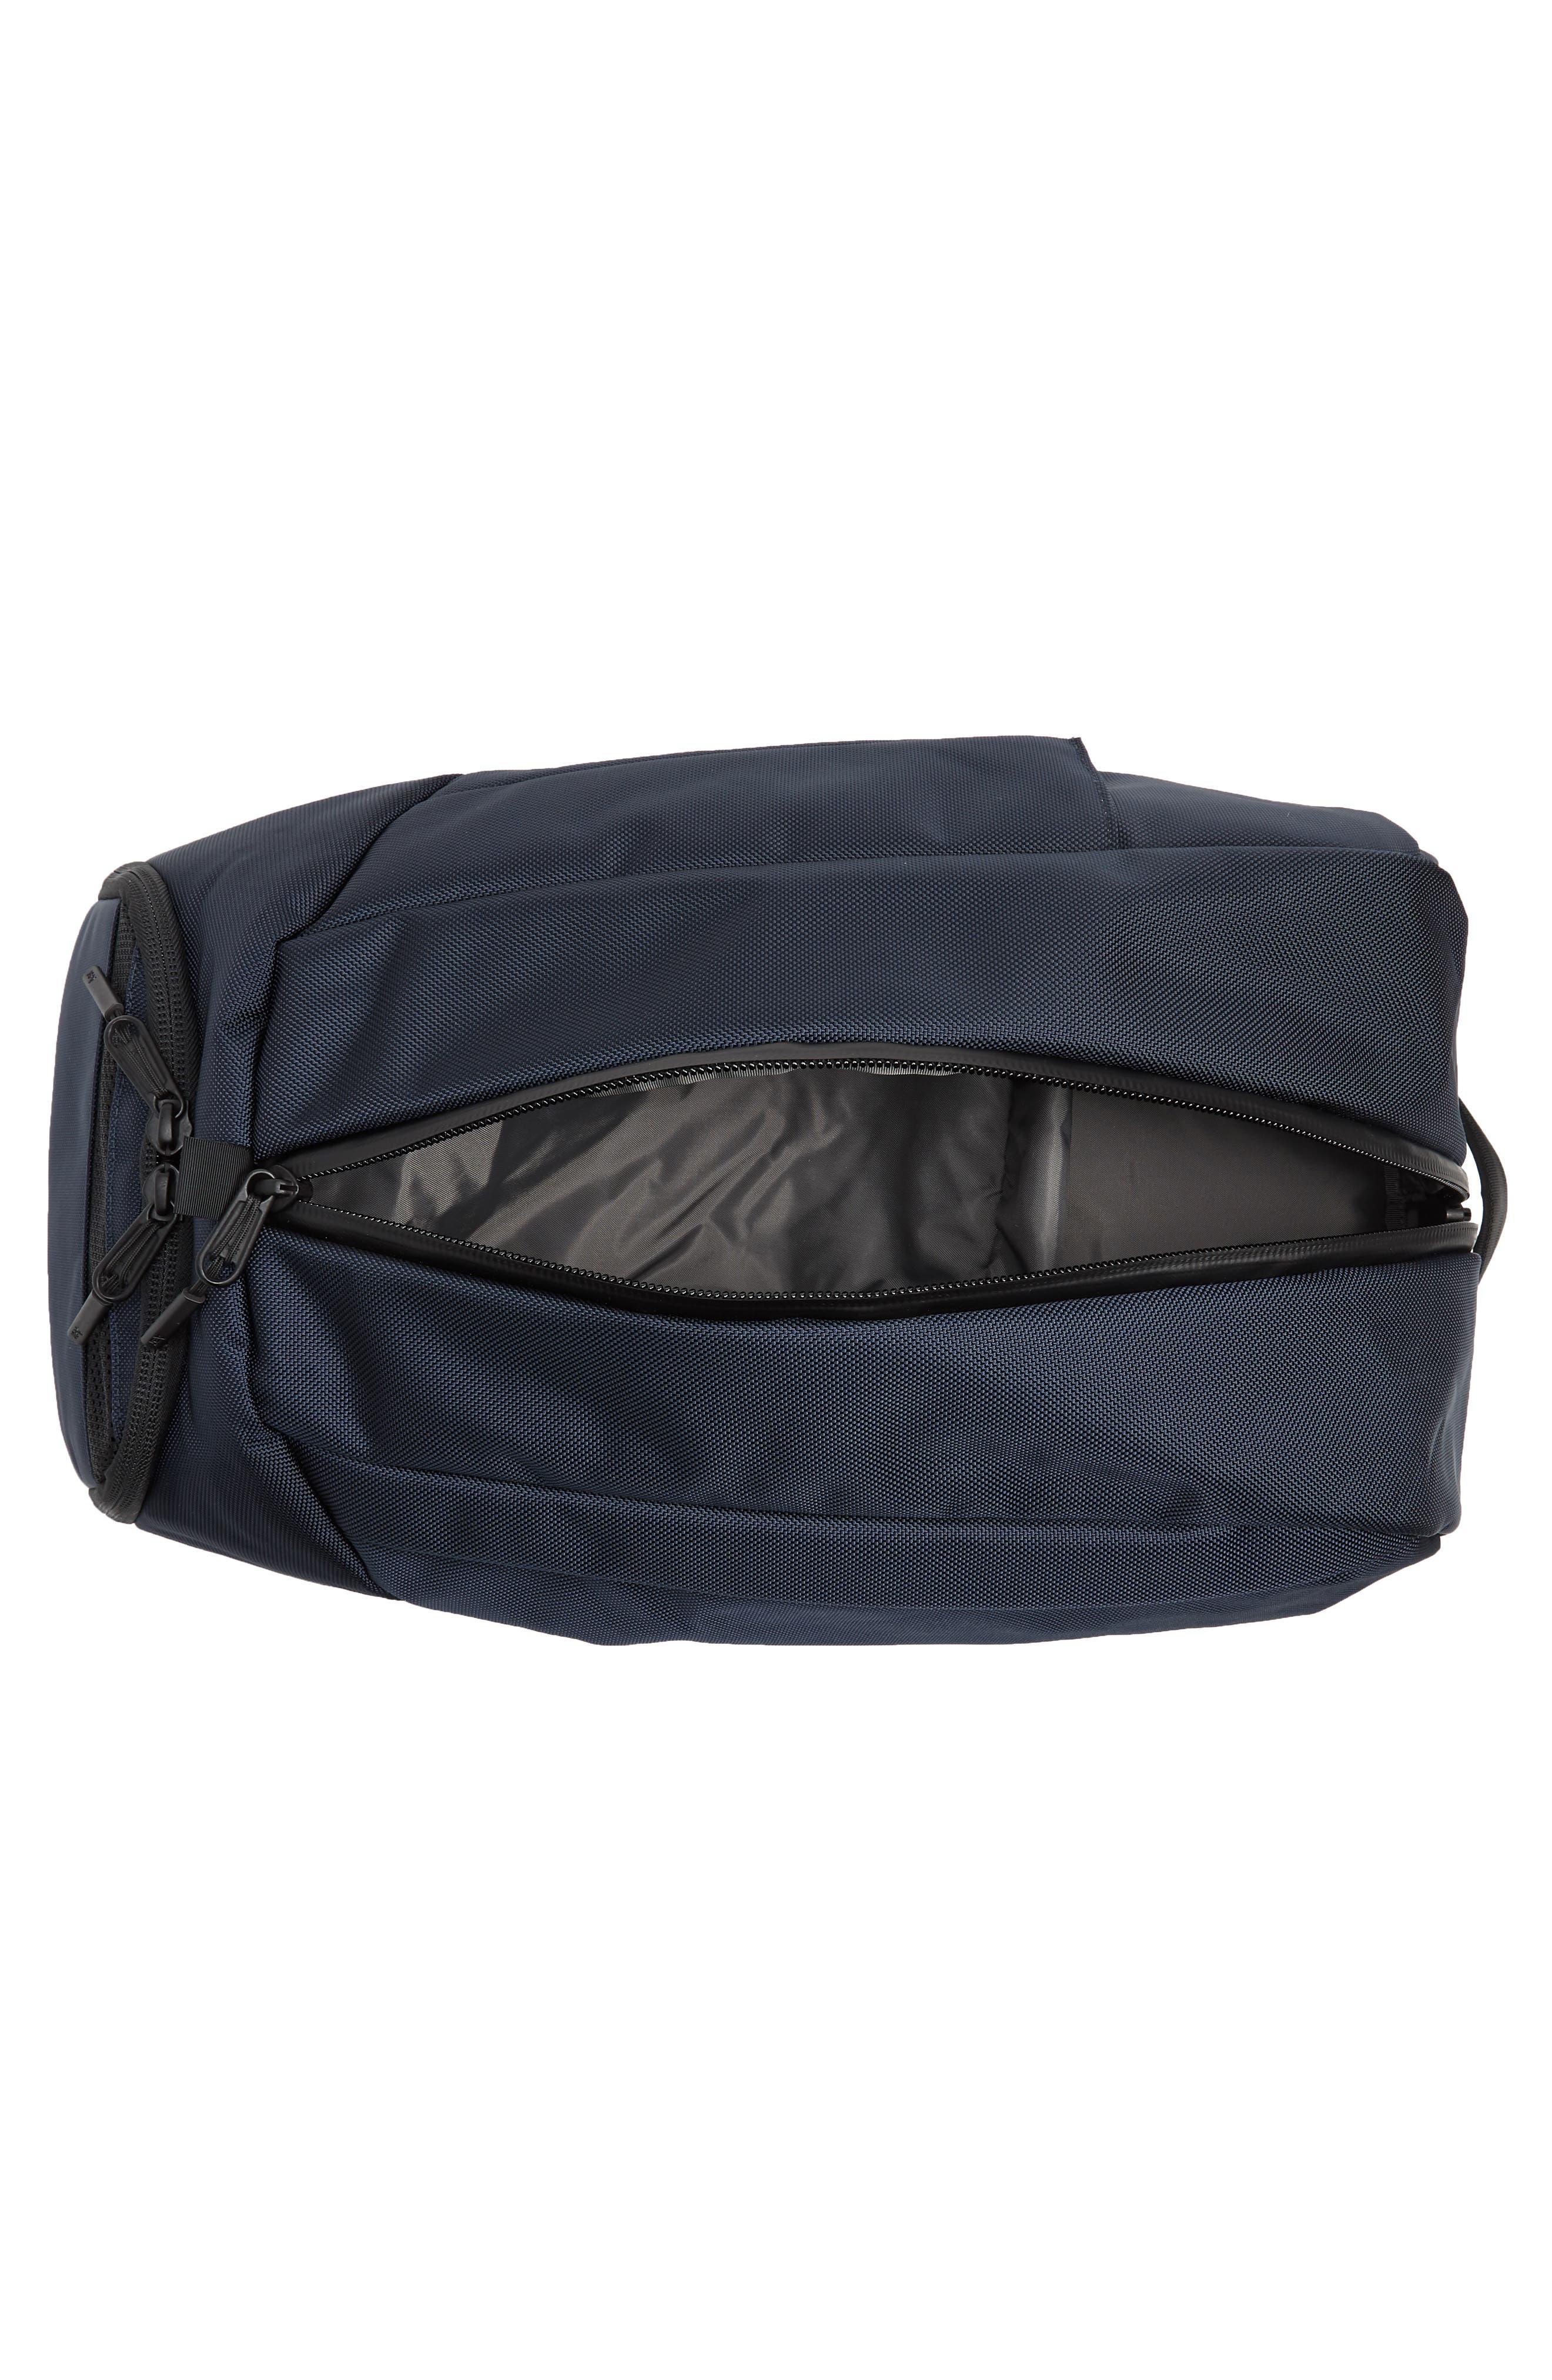 Duffel Pack 2 Convertible Backpack,                             Alternate thumbnail 5, color,                             Navy